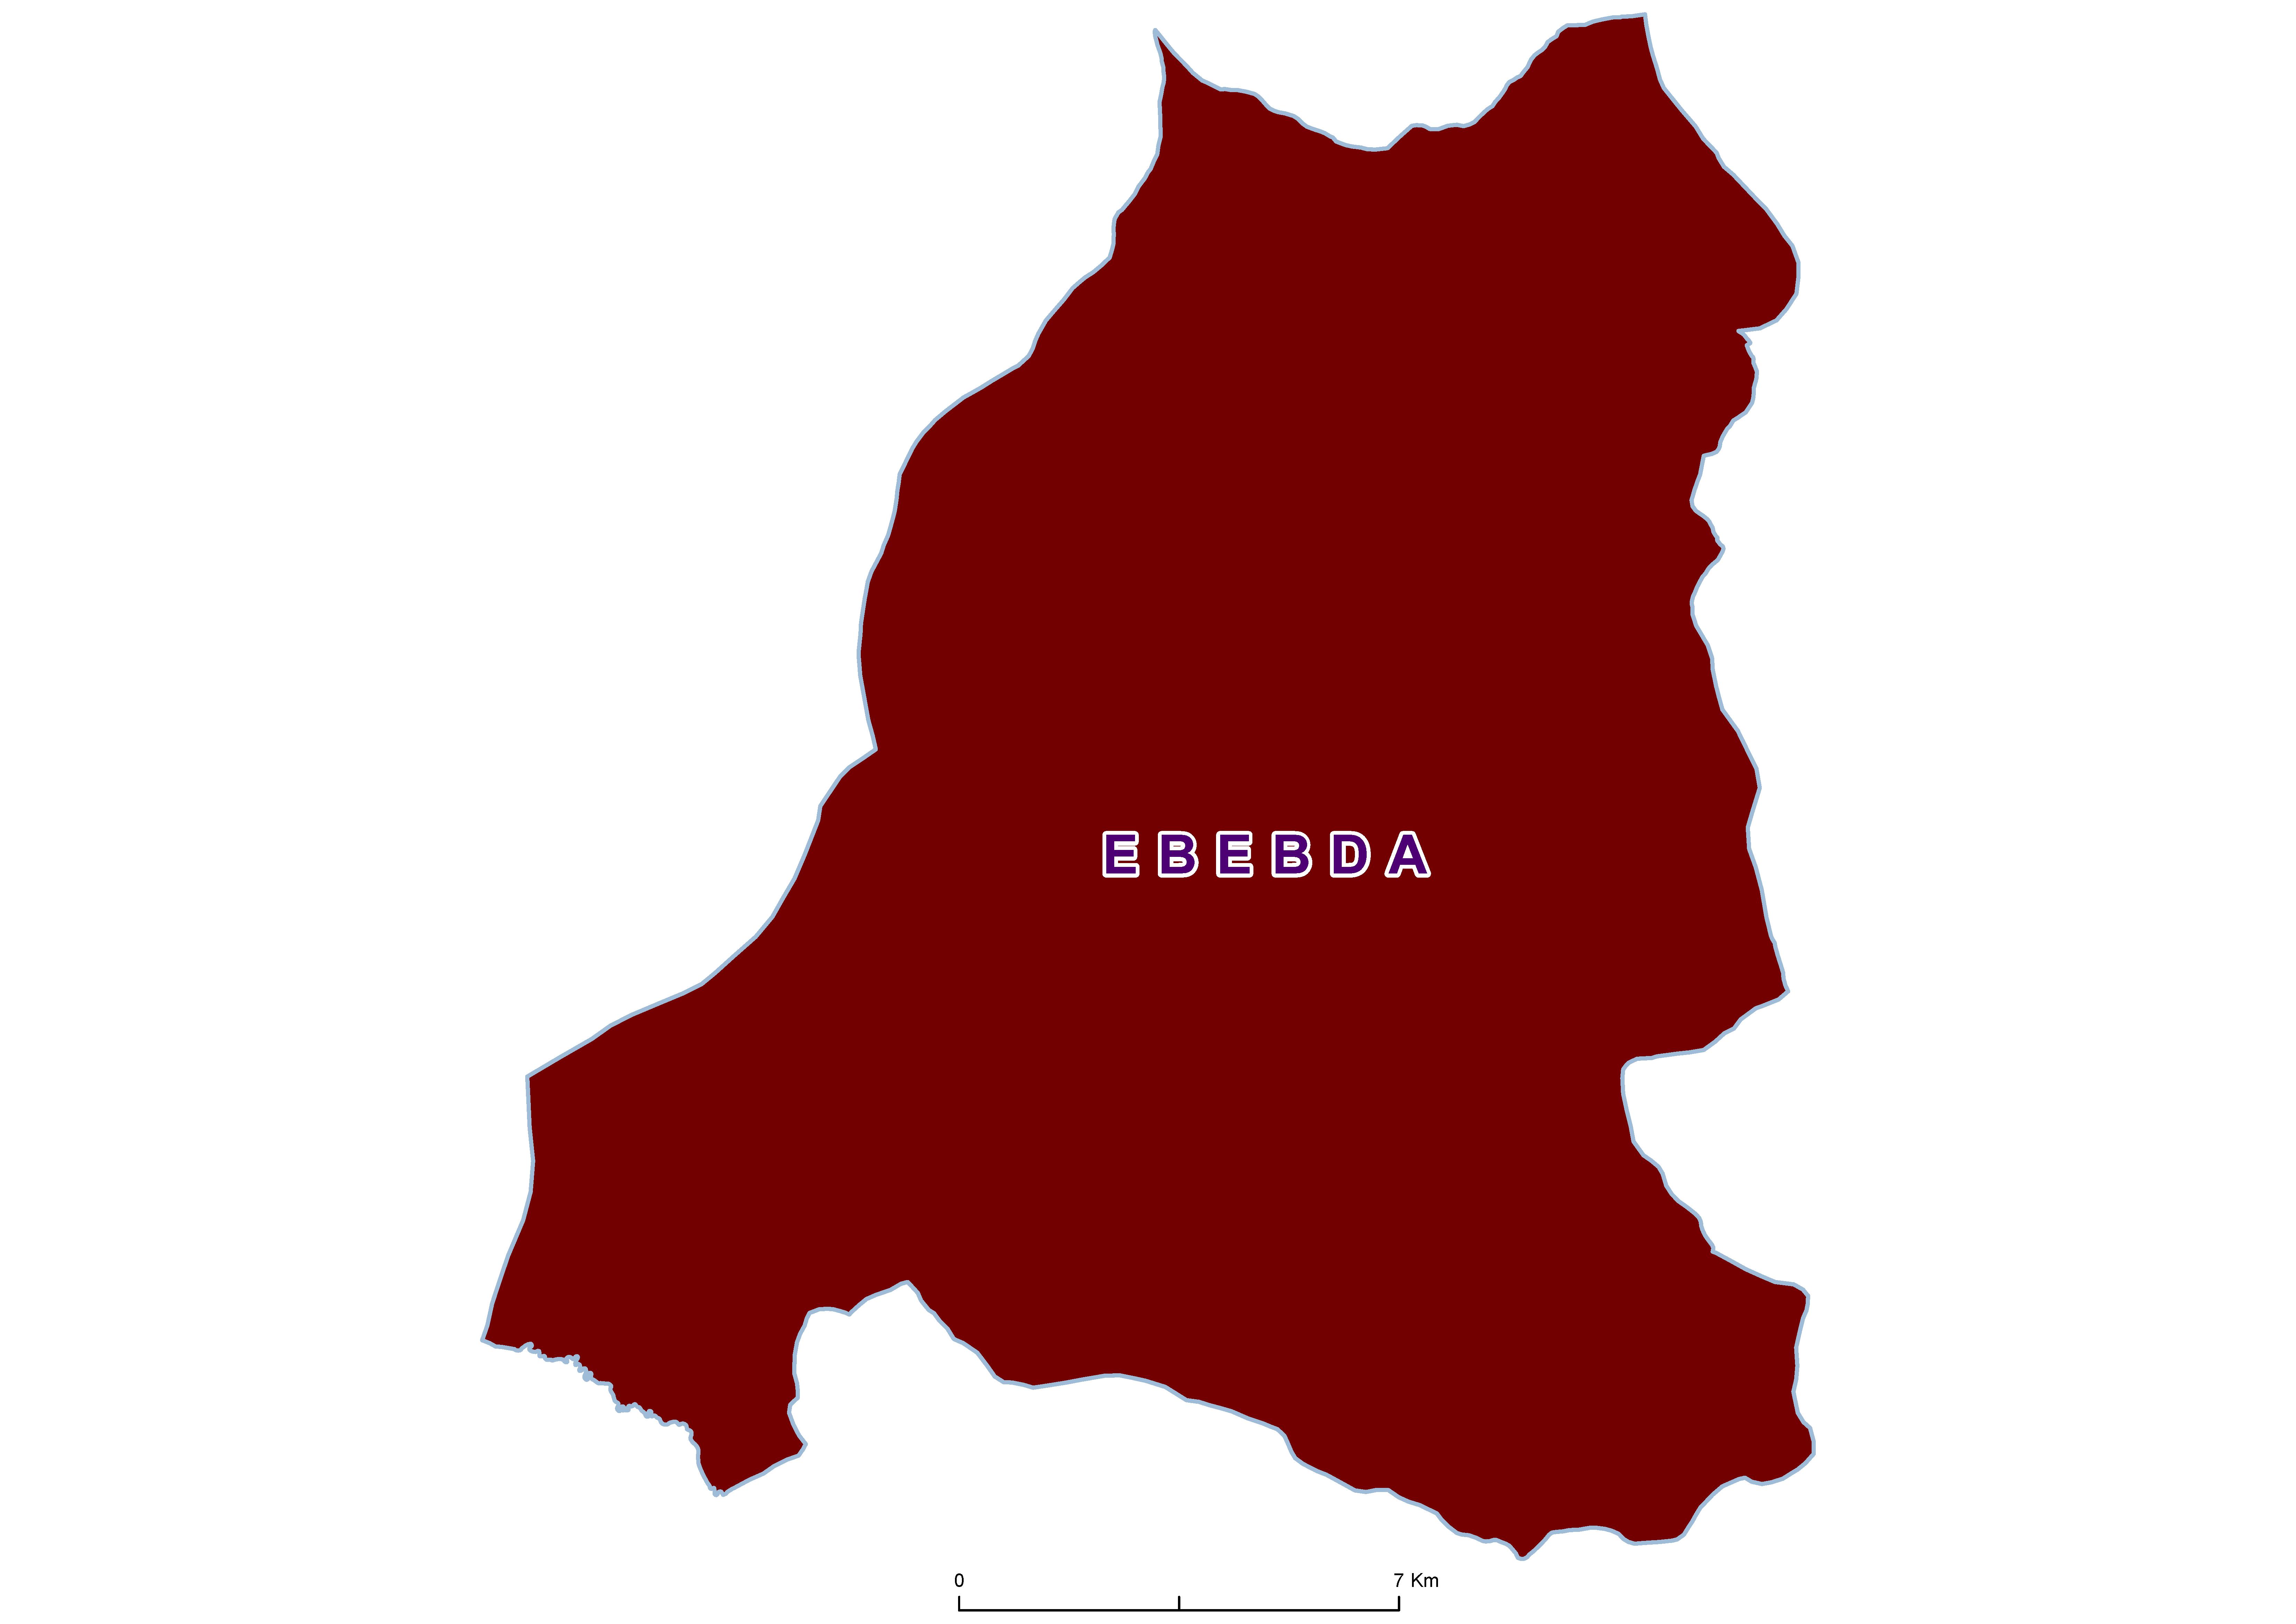 Ebebda Mean STH 19850001